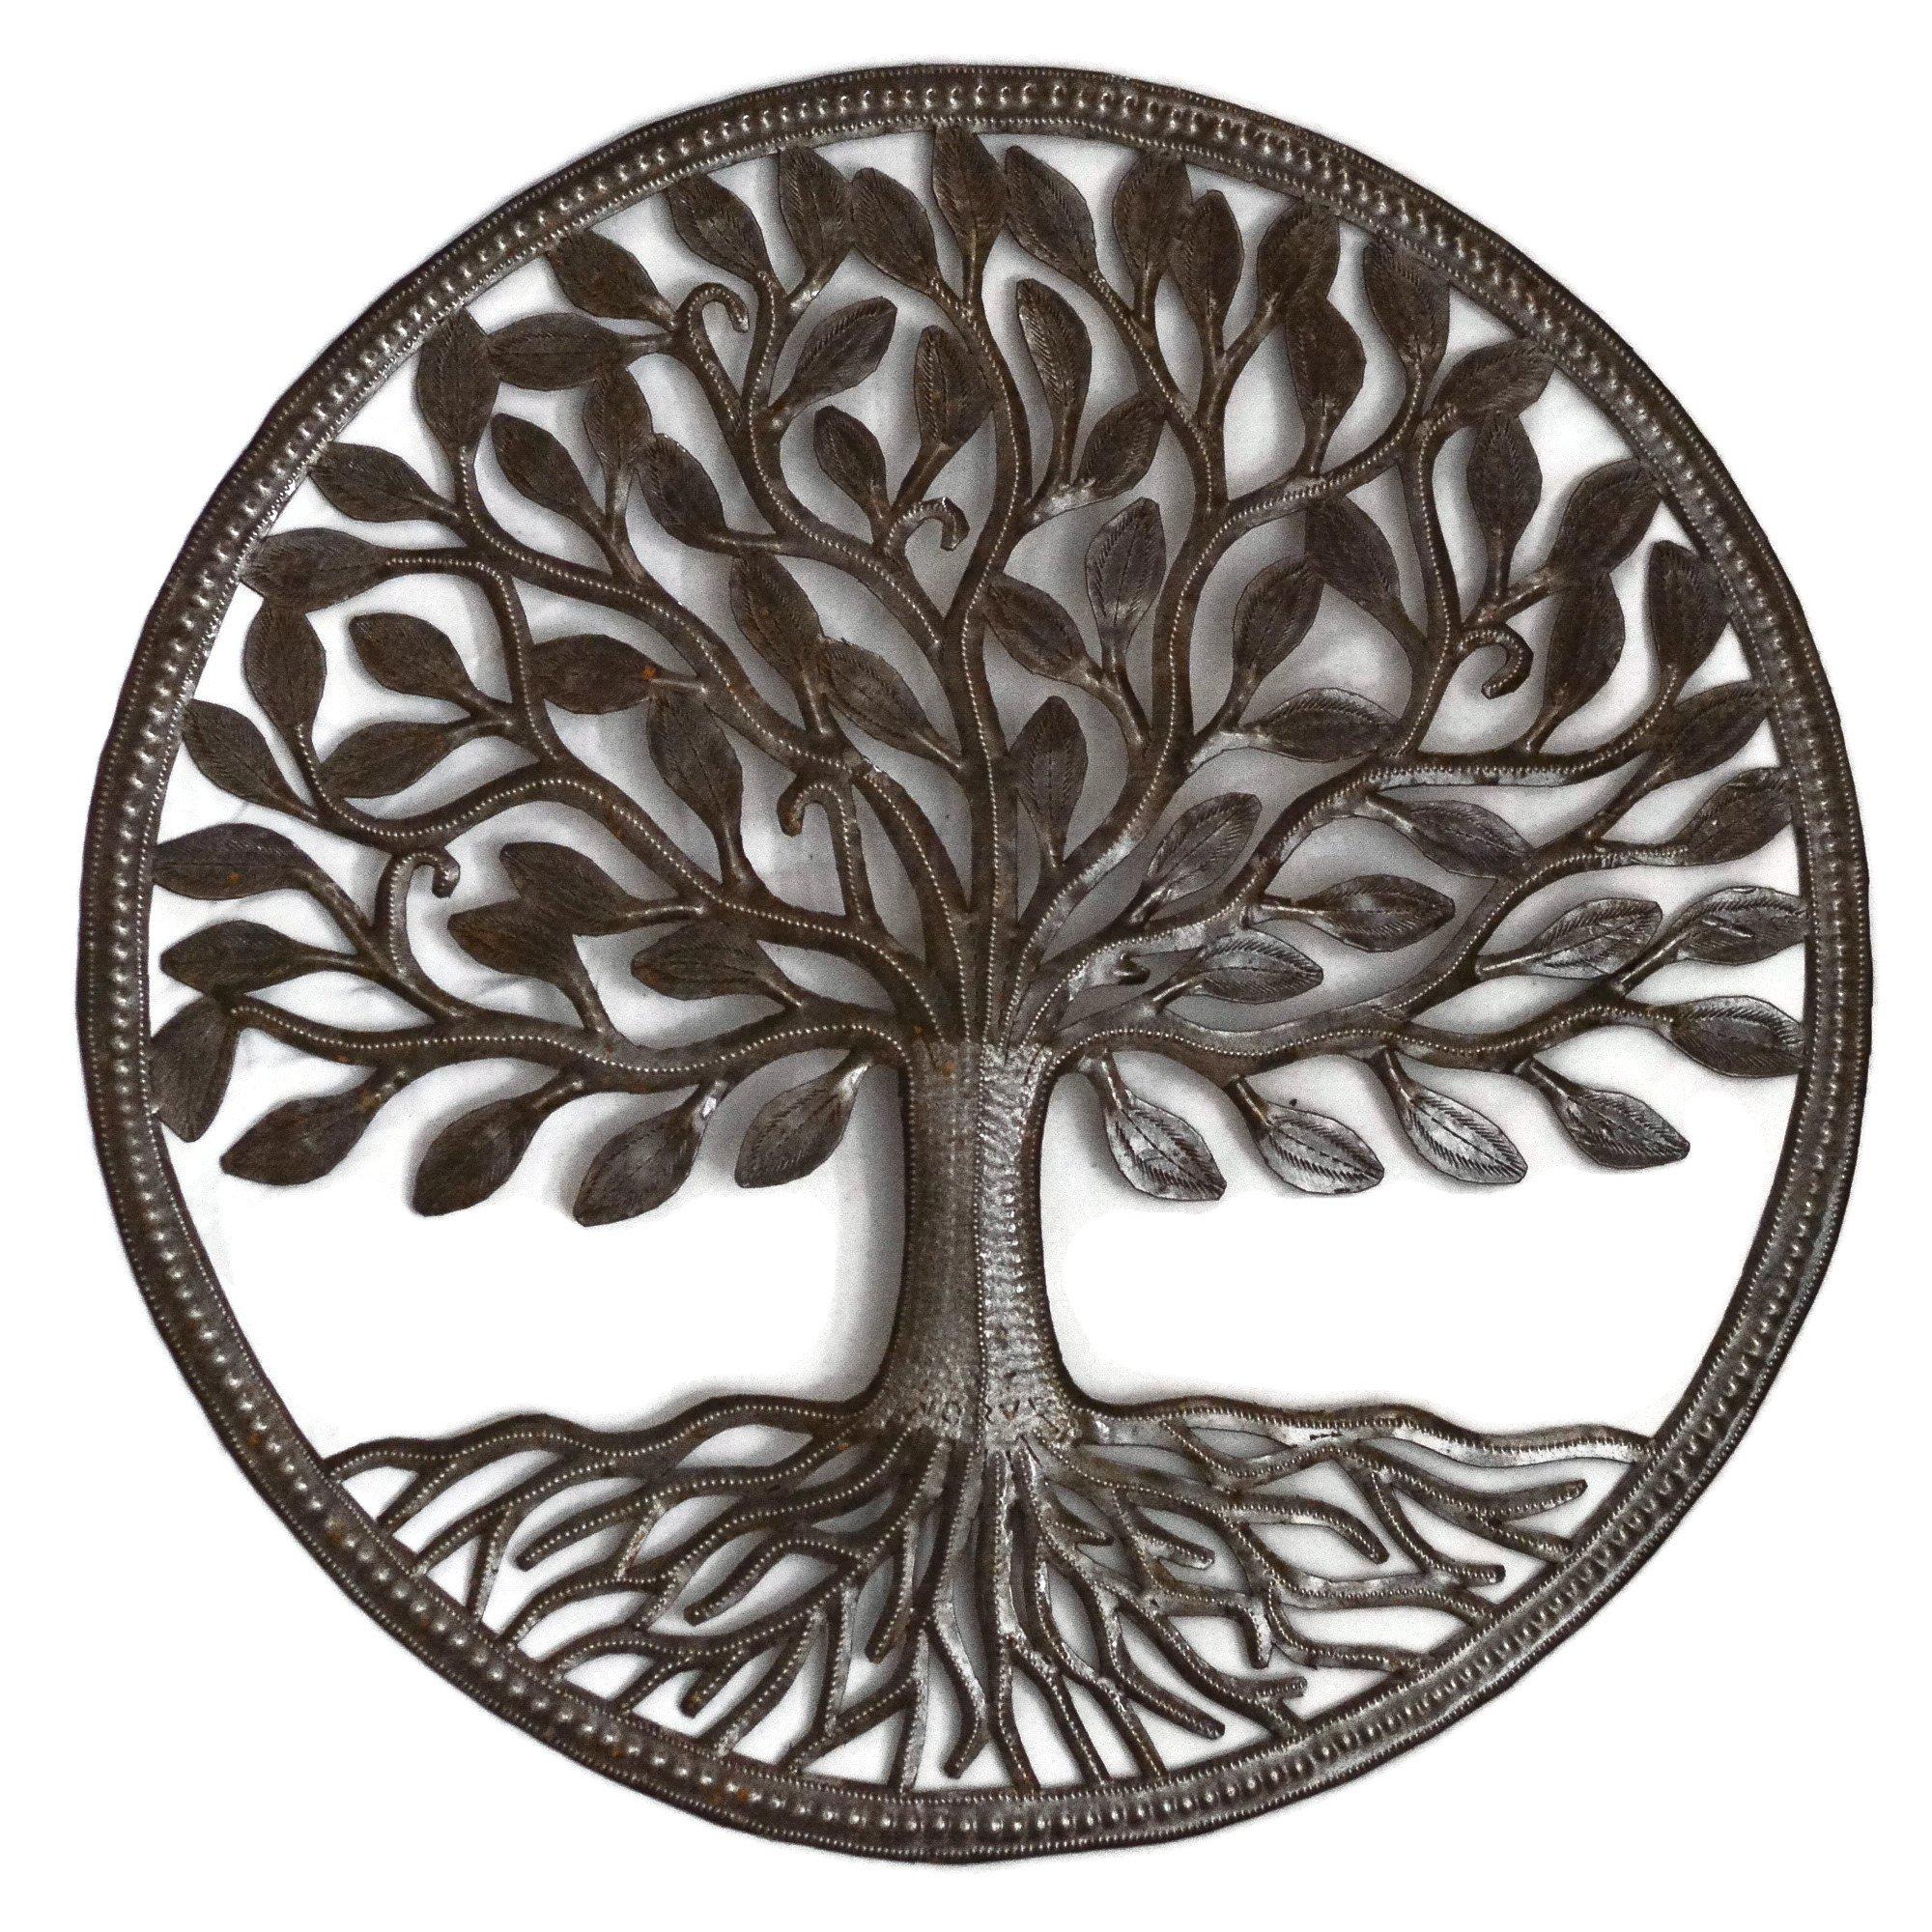 Steel Drum Organic Tree of Life Recycled Metal Art from Haiti, 23'' X 23''